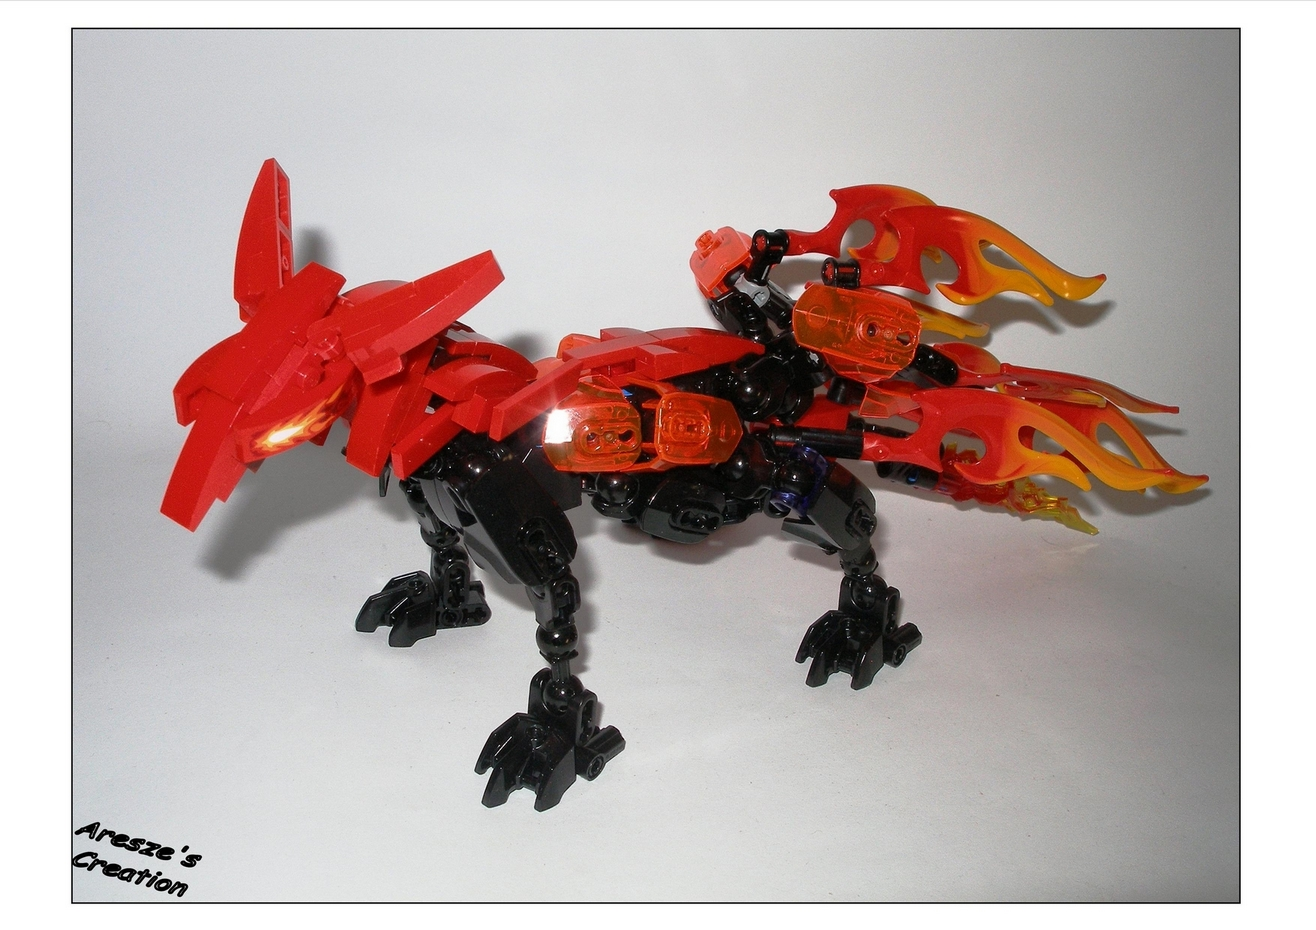 aresze moc - Nine-tailed Fox 003